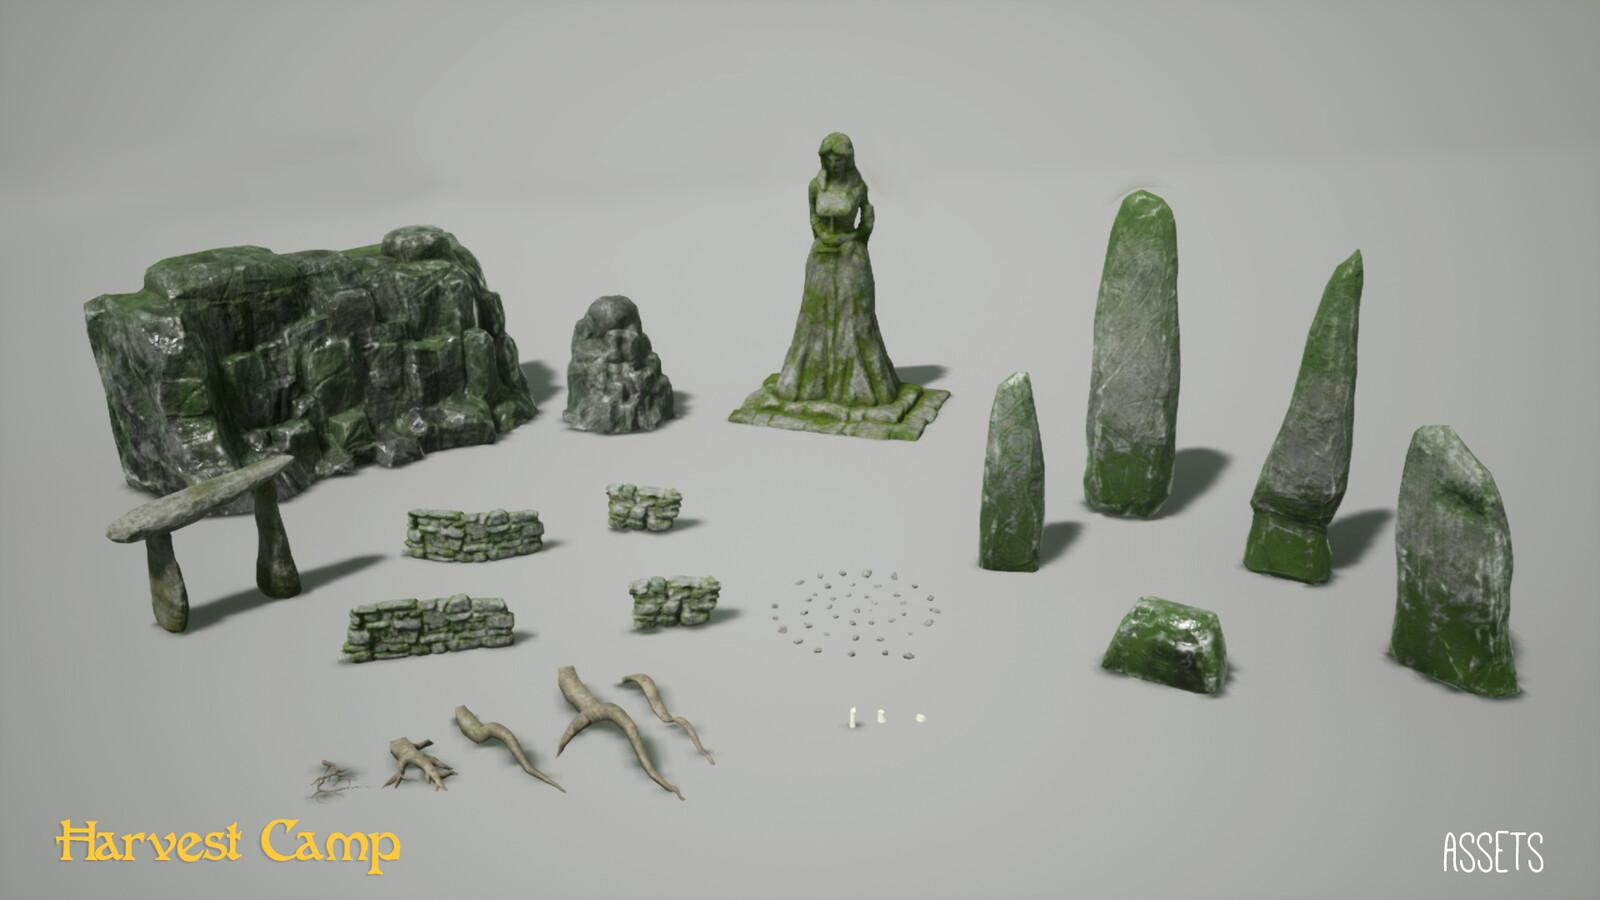 Display of assets that I modelled.